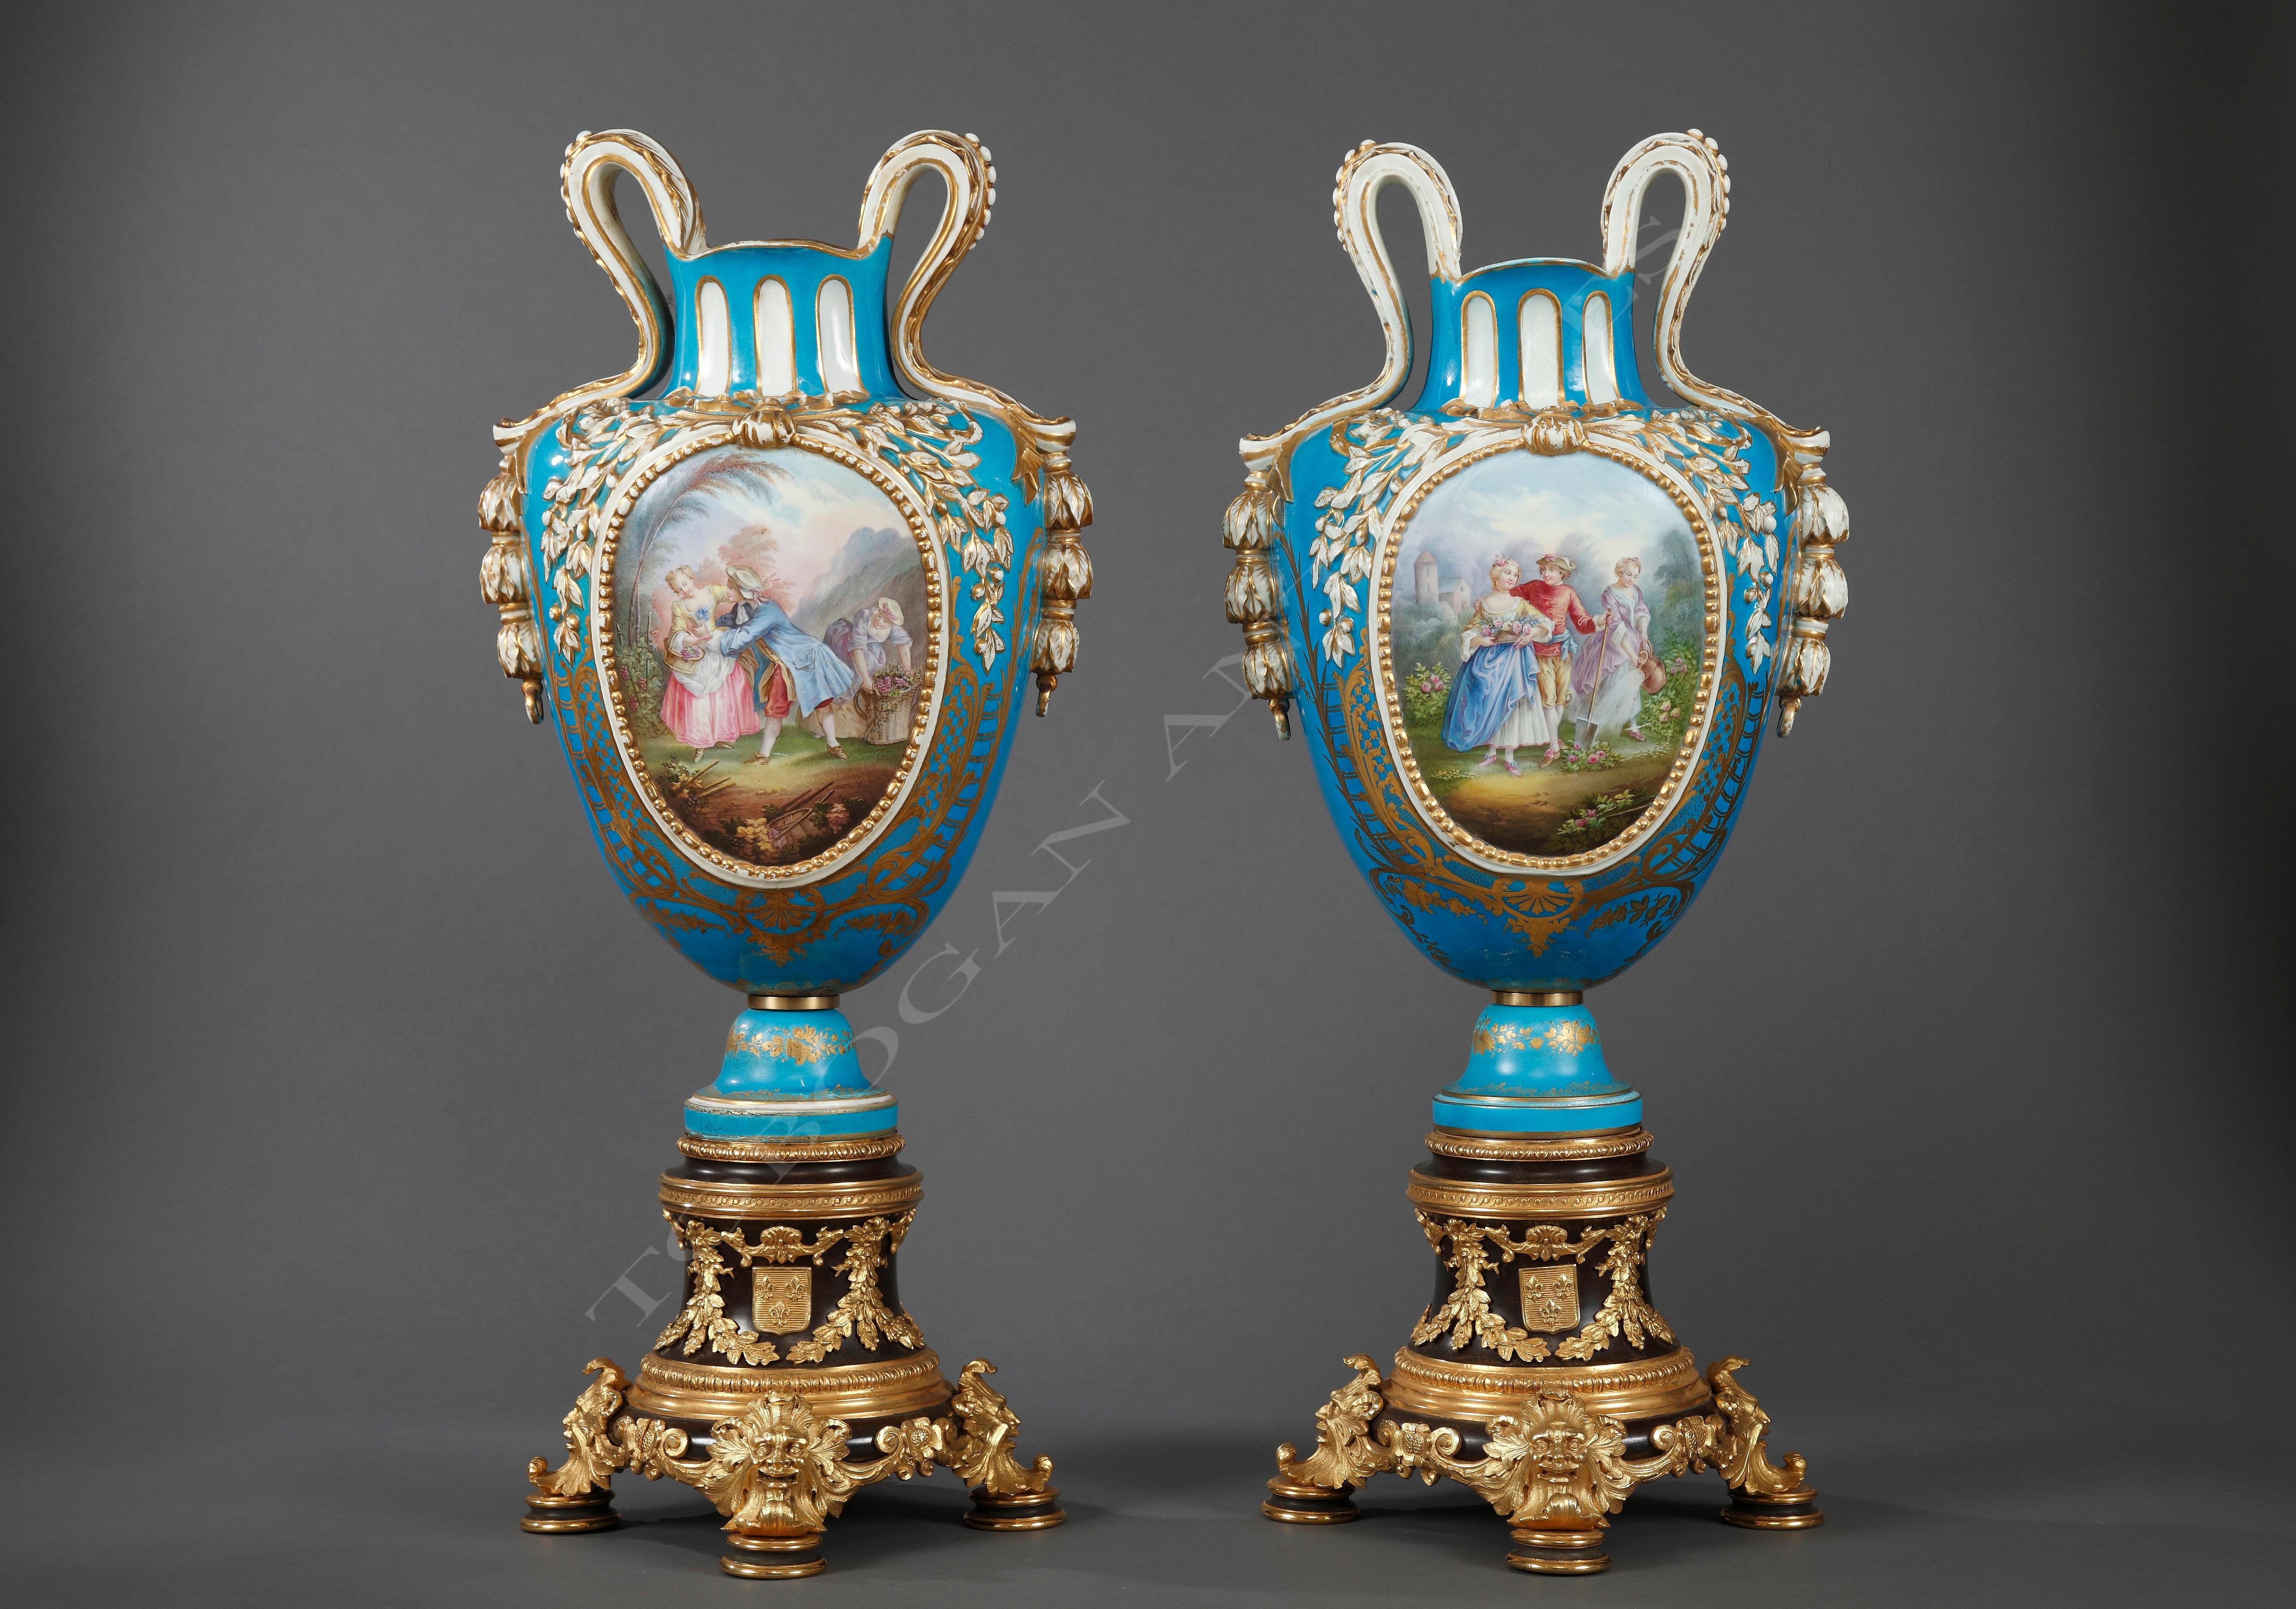 Svres pair of ormolu porcelain vases tobogan antiques svres pair of ormolu porcelain vases tobogan antiques reviewsmspy